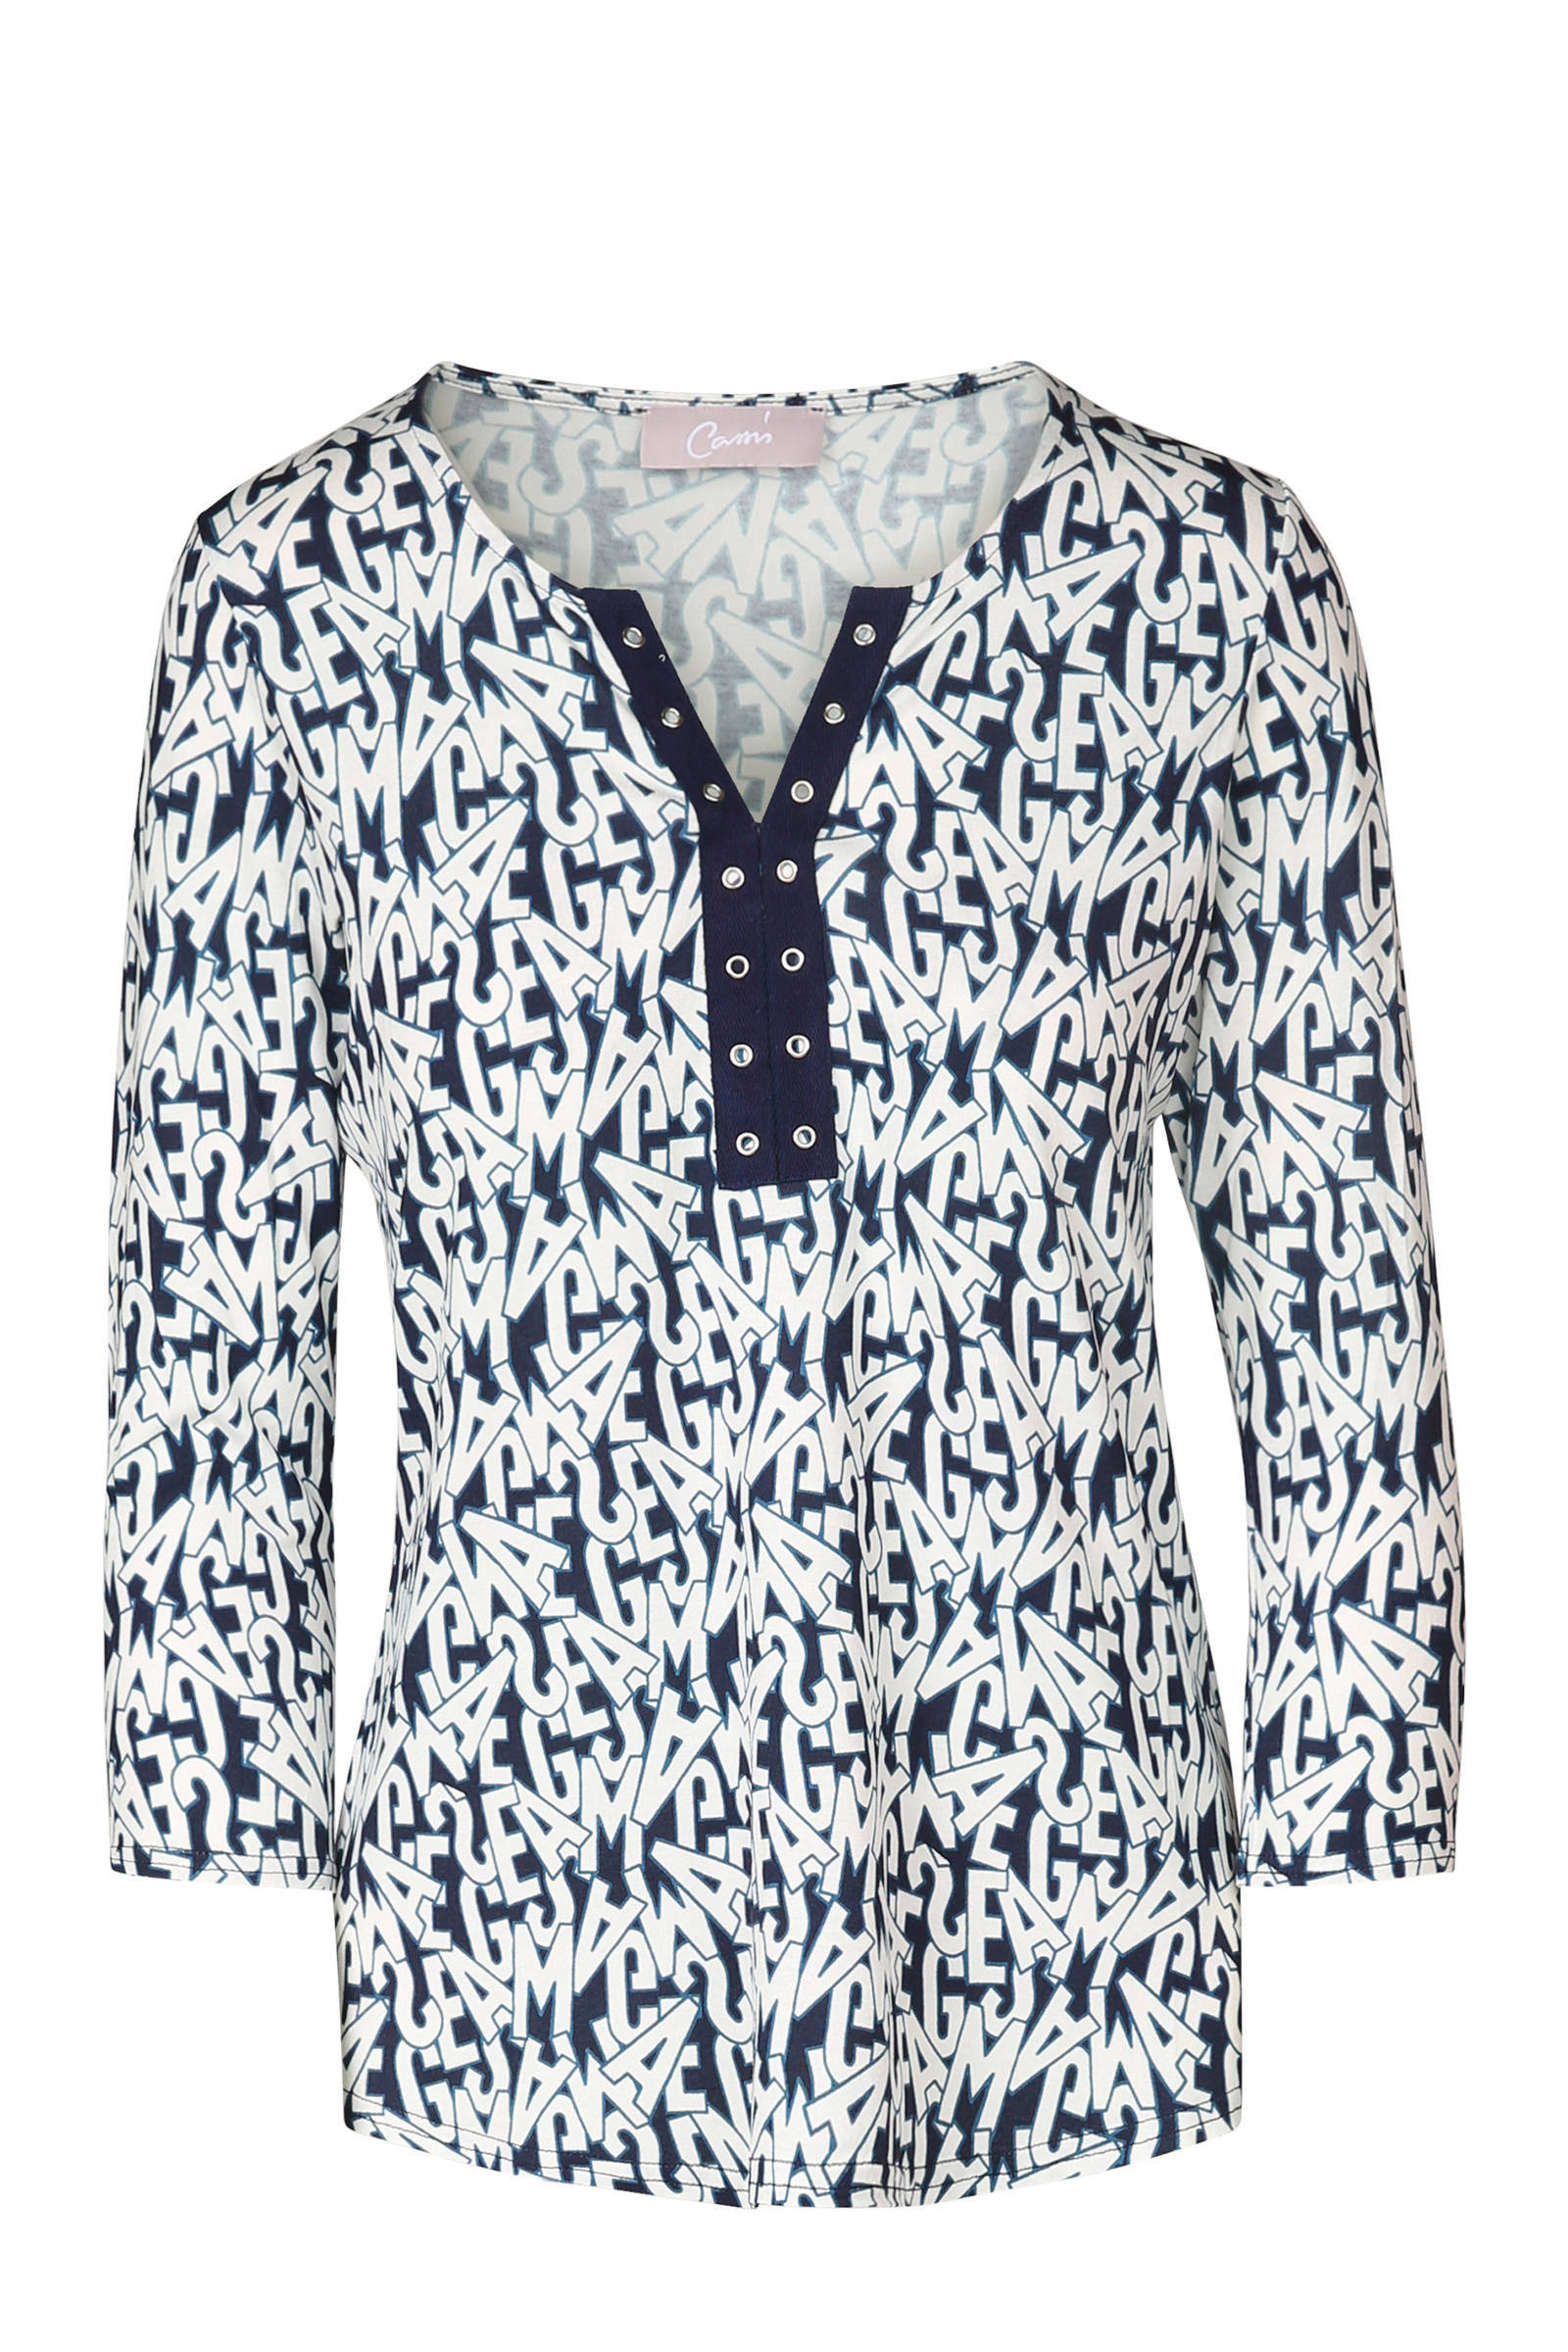 vanaf bij wehkamp topsamp; blouses Gratis bezorging Cassis 20 dCtrxshQ